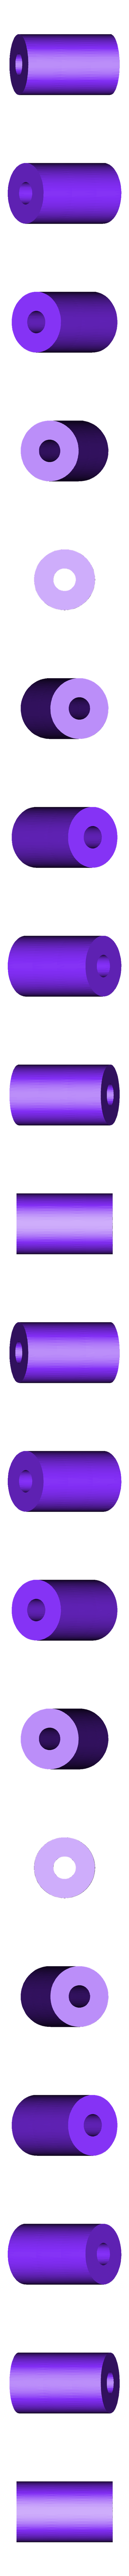 spine_spacer.stl Download free STL file Airbus Inspired Aviation Lamp - Remix • 3D printing design, FreeBug